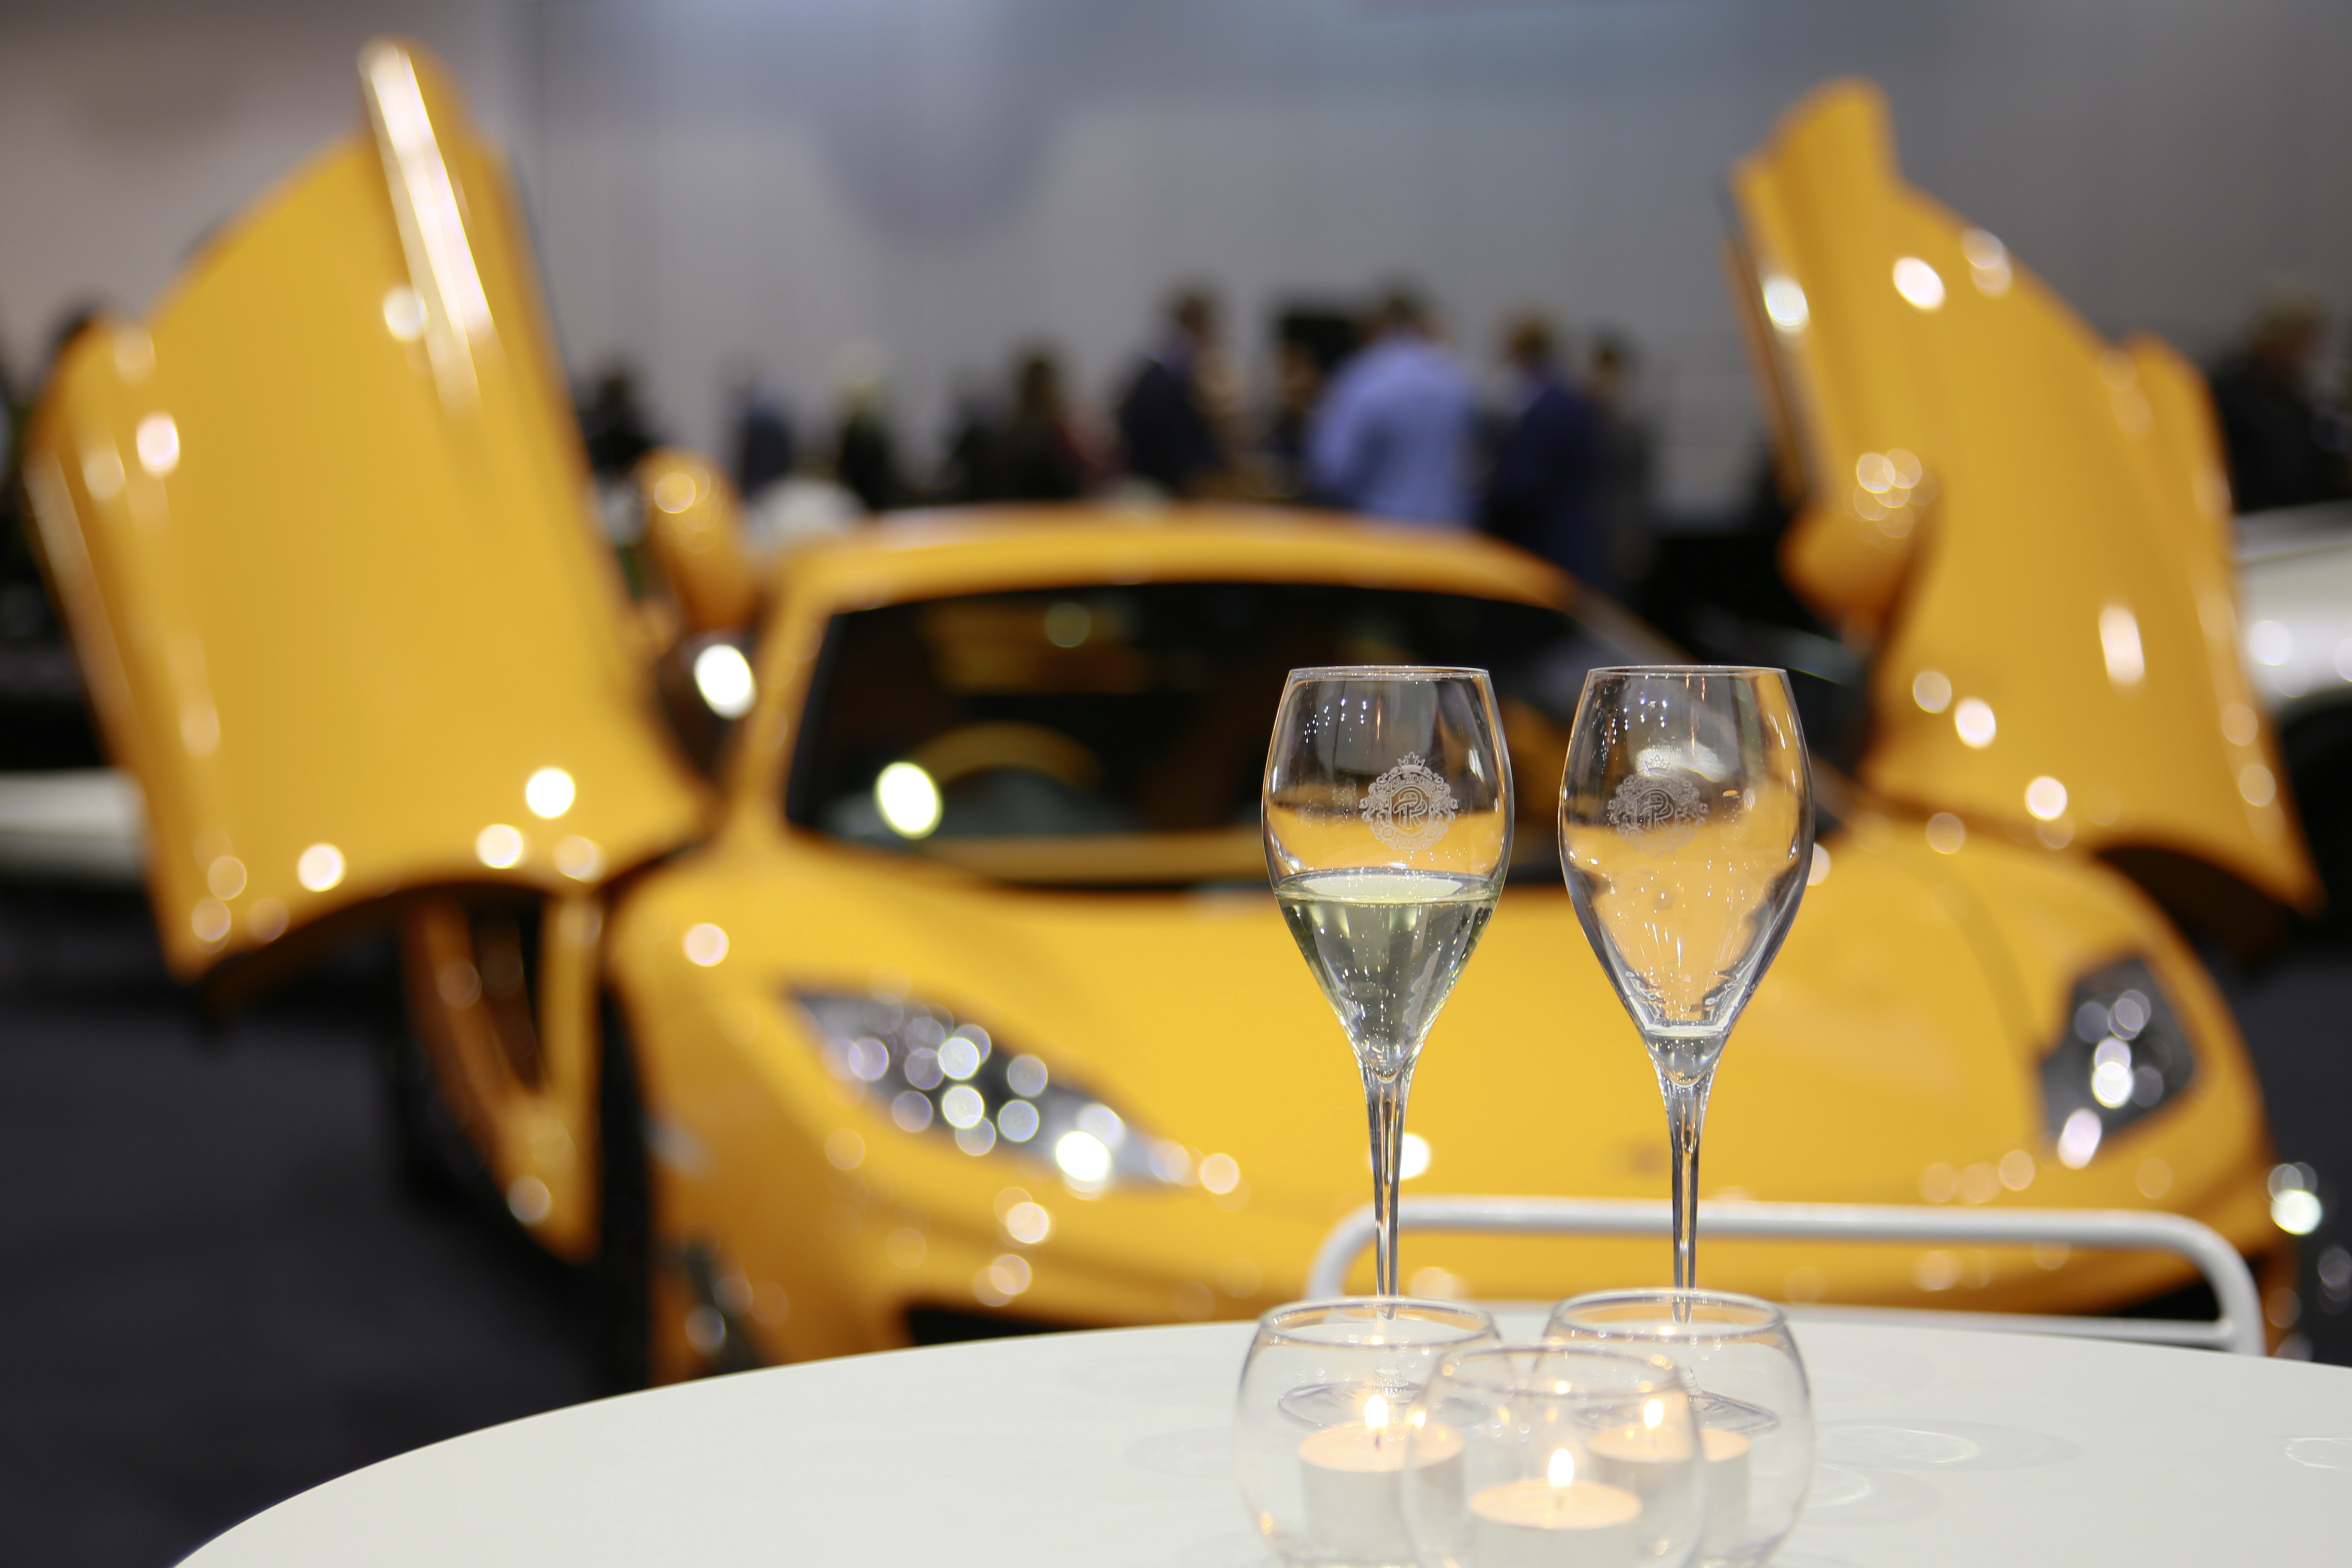 Lamborghini and champagne glasses